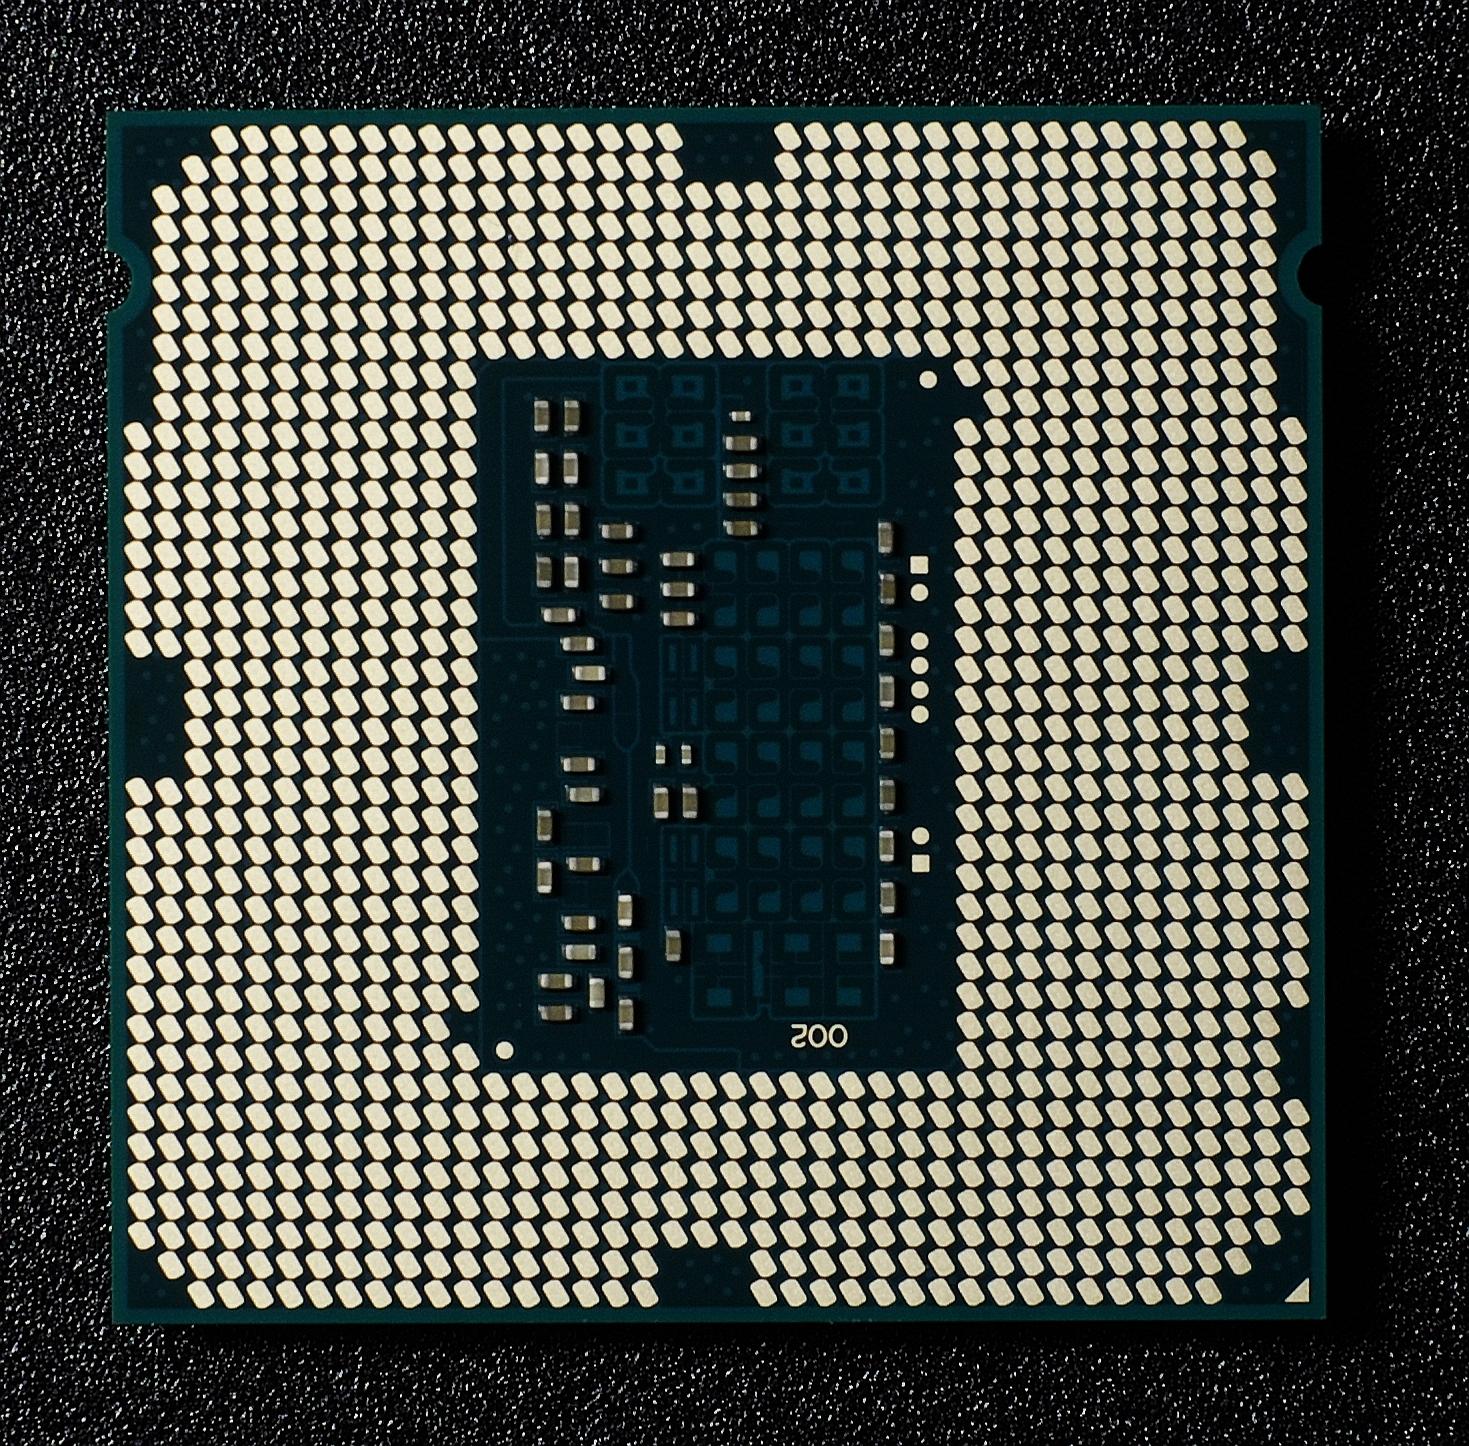 File:Intel core i5-4430 bottom Socket 1150 IMGP8599 smial wp.jpg